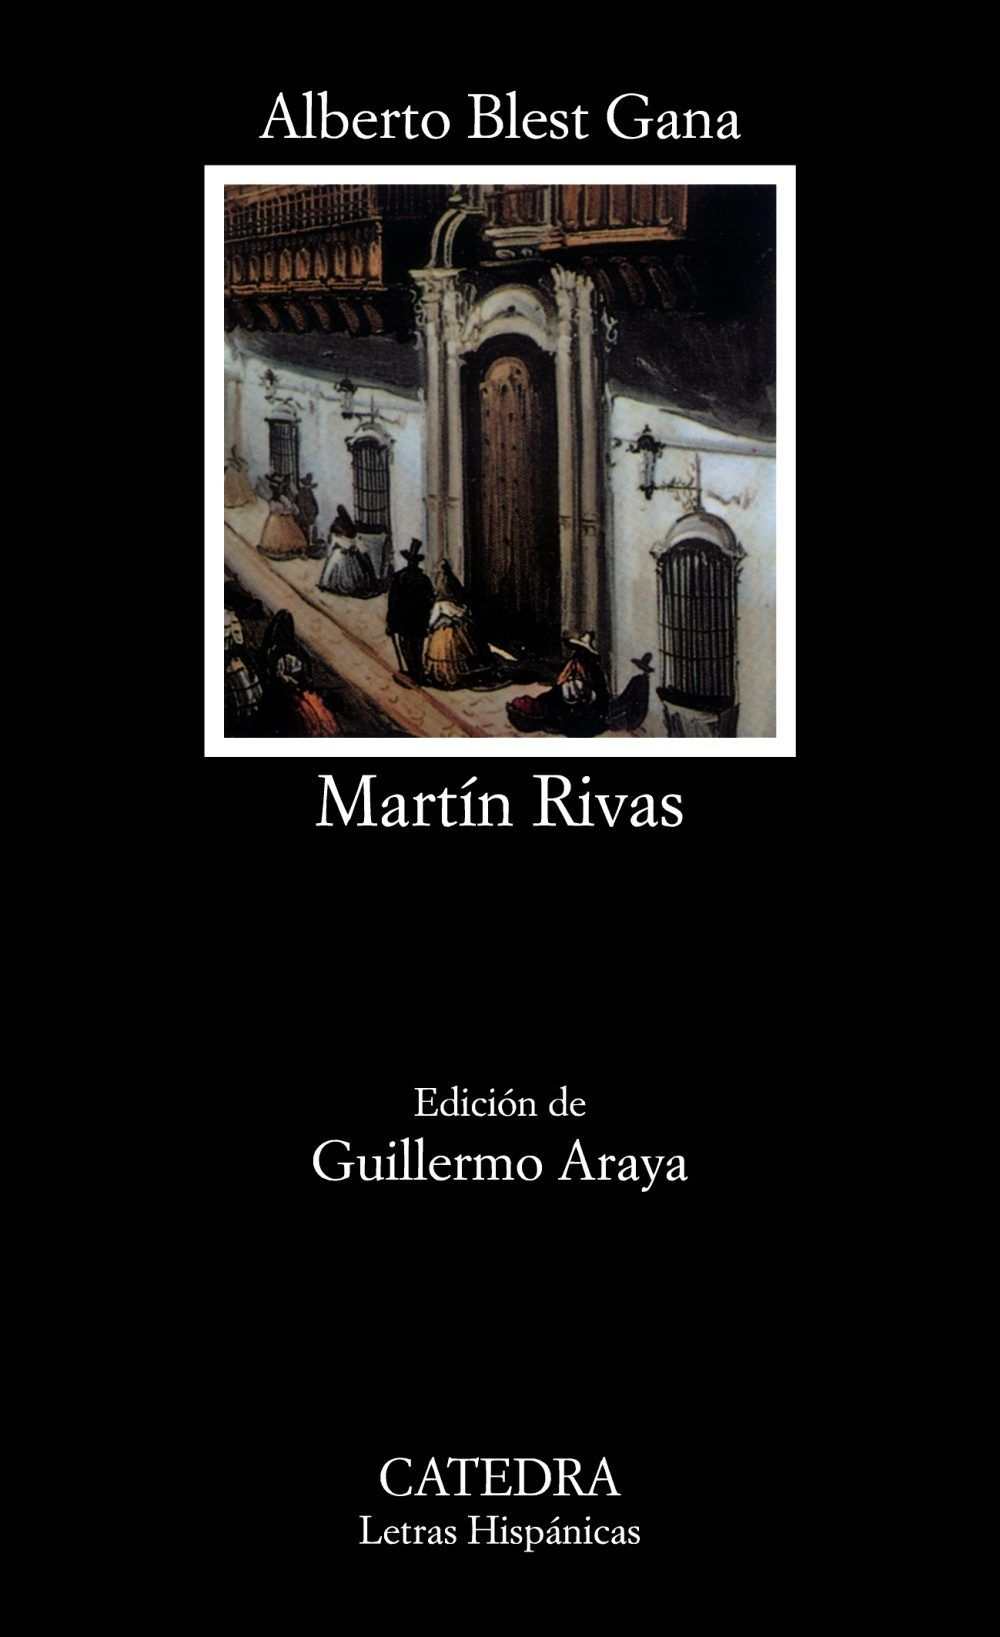 Portada de Martín Rivas, de Alberto Blest